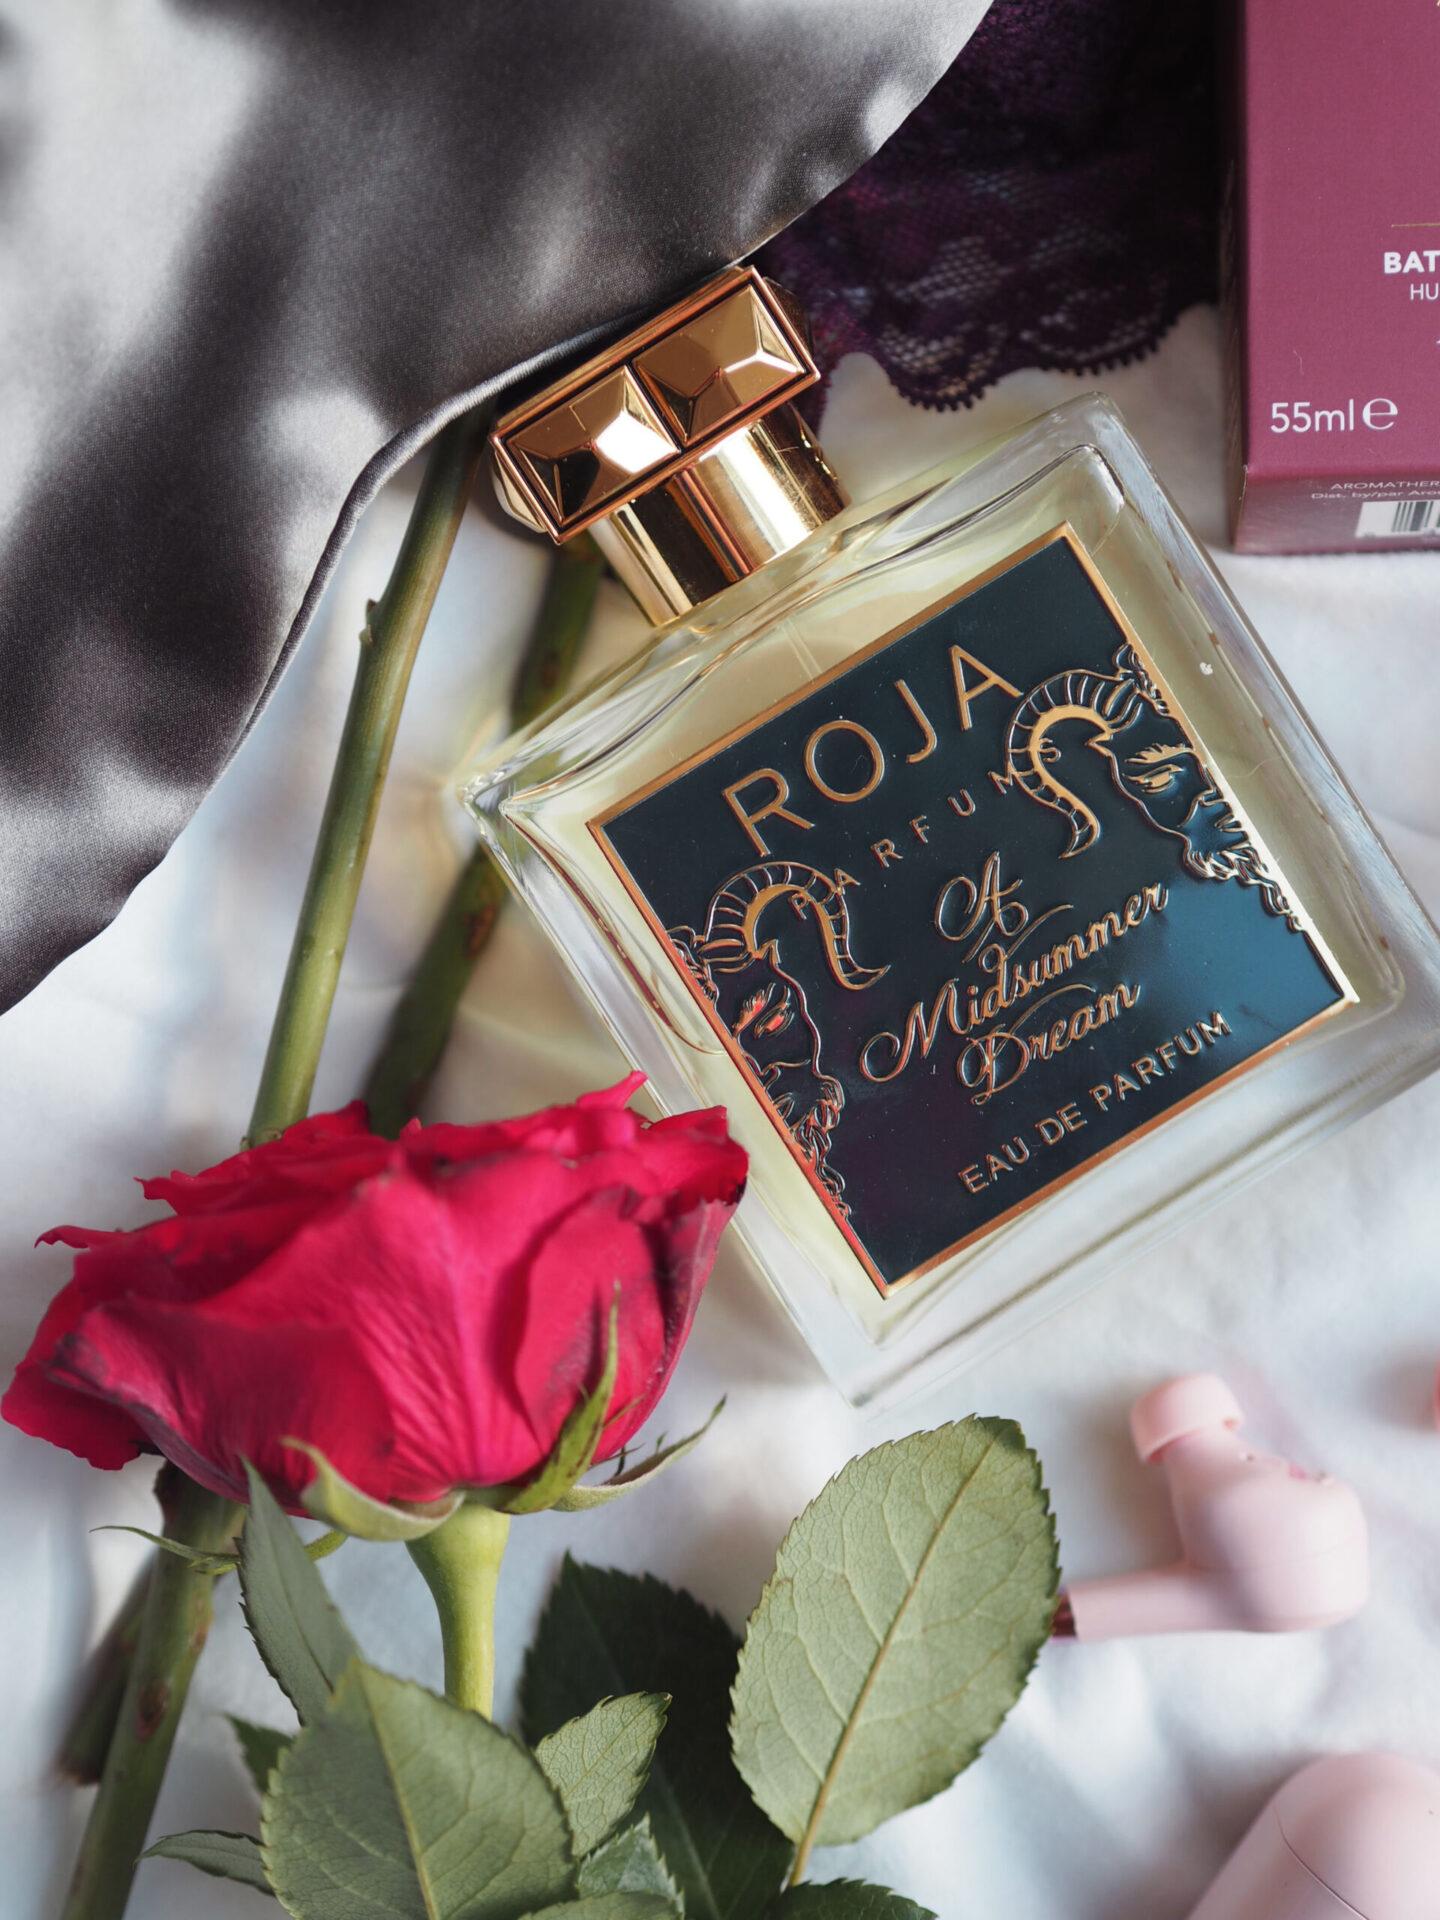 roja dove a midsummer dream eau de parfum